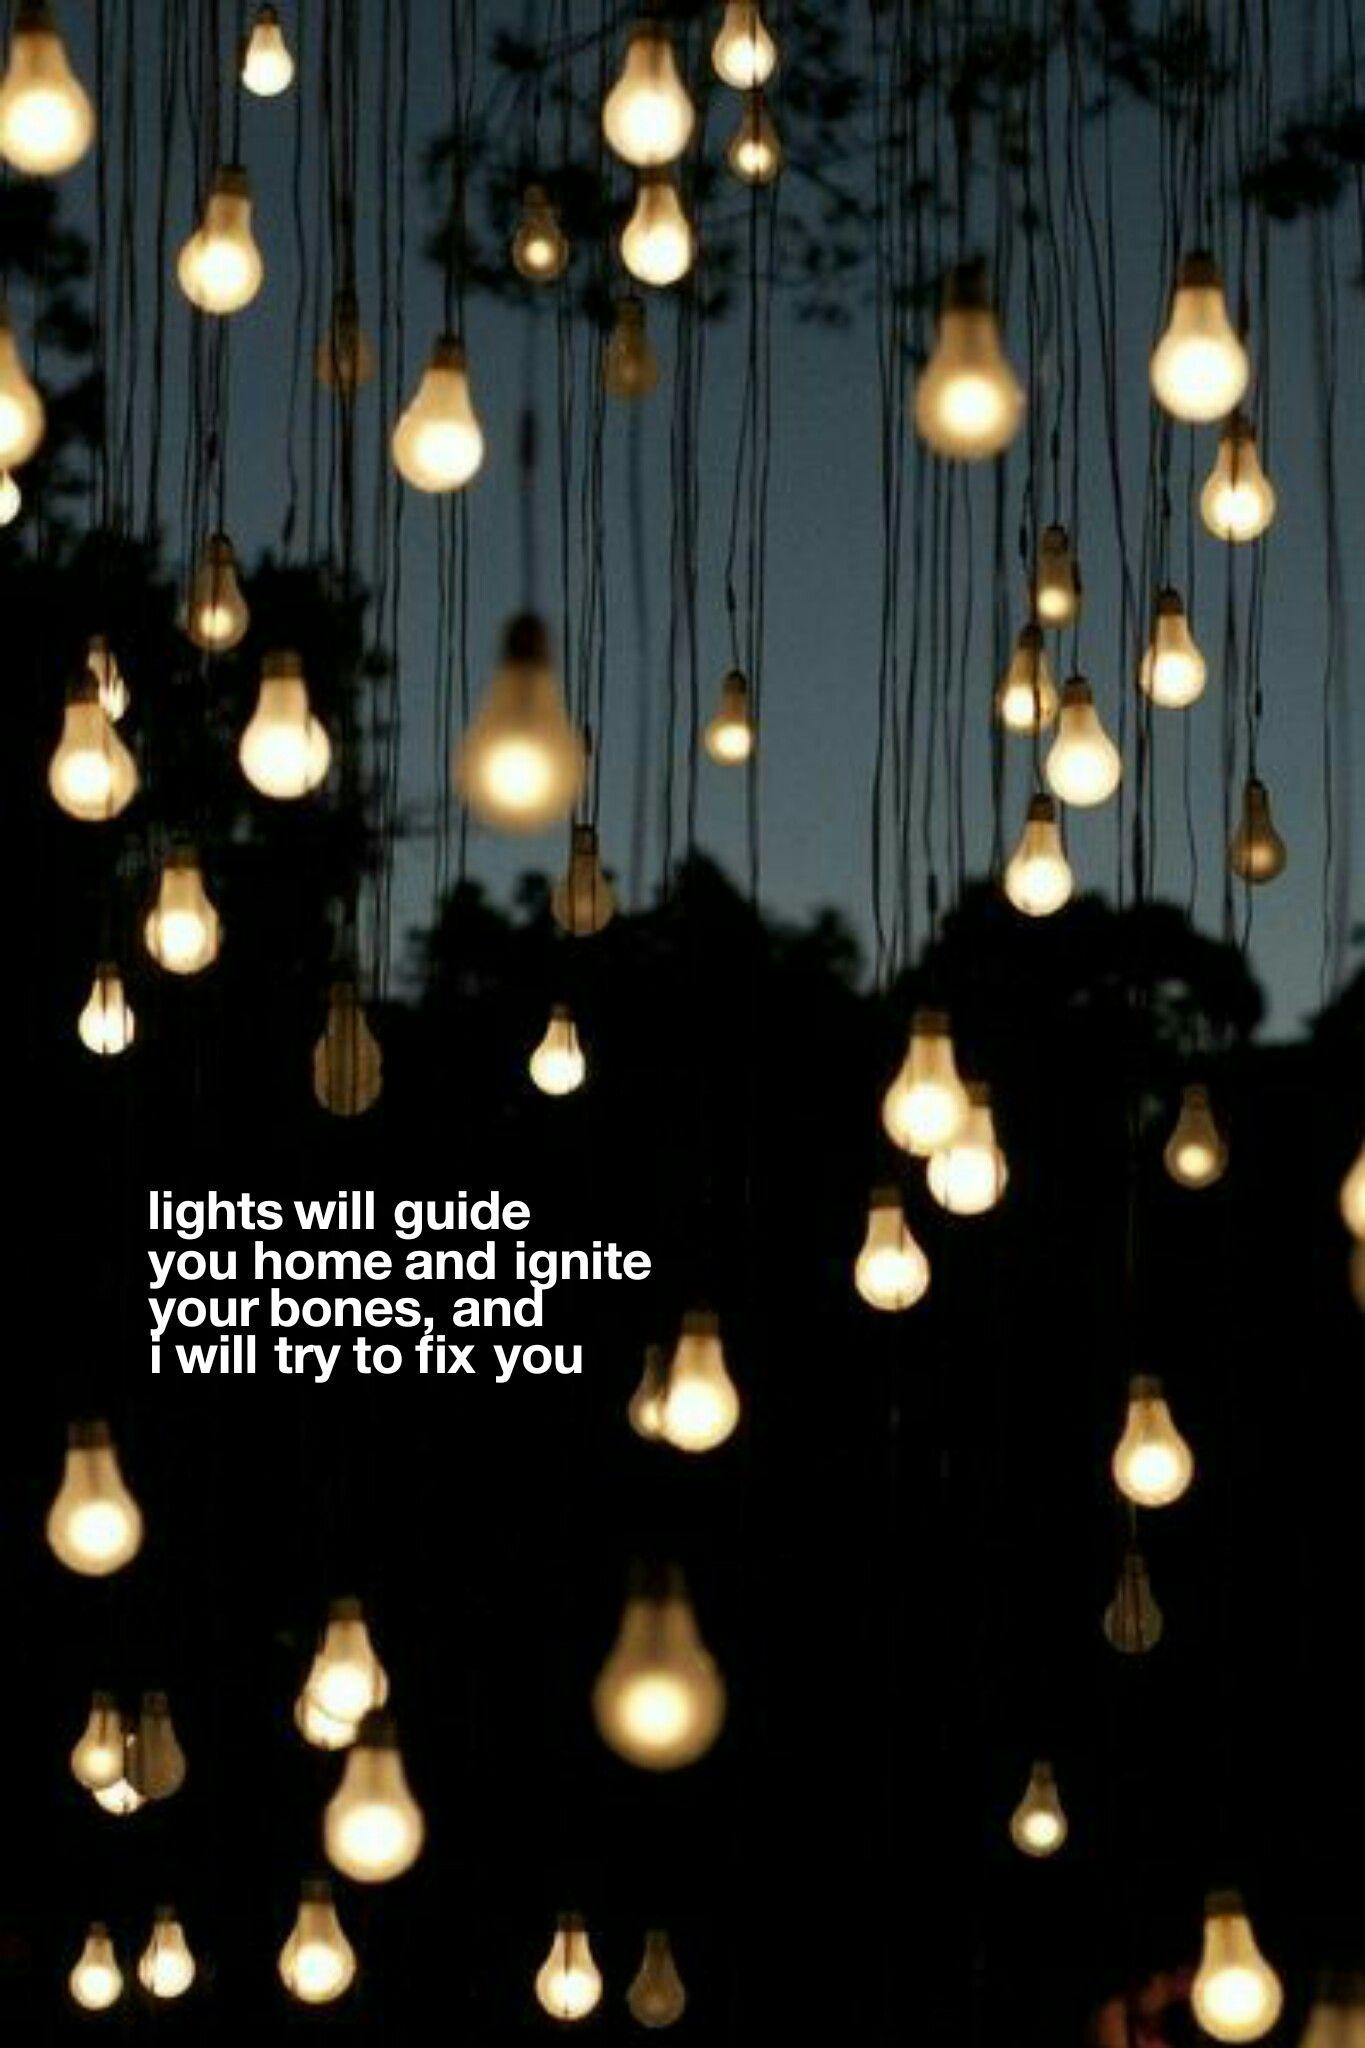 Lyric Wallpaper: Coldplay - Fix You | Coldplay | Pinterest ...